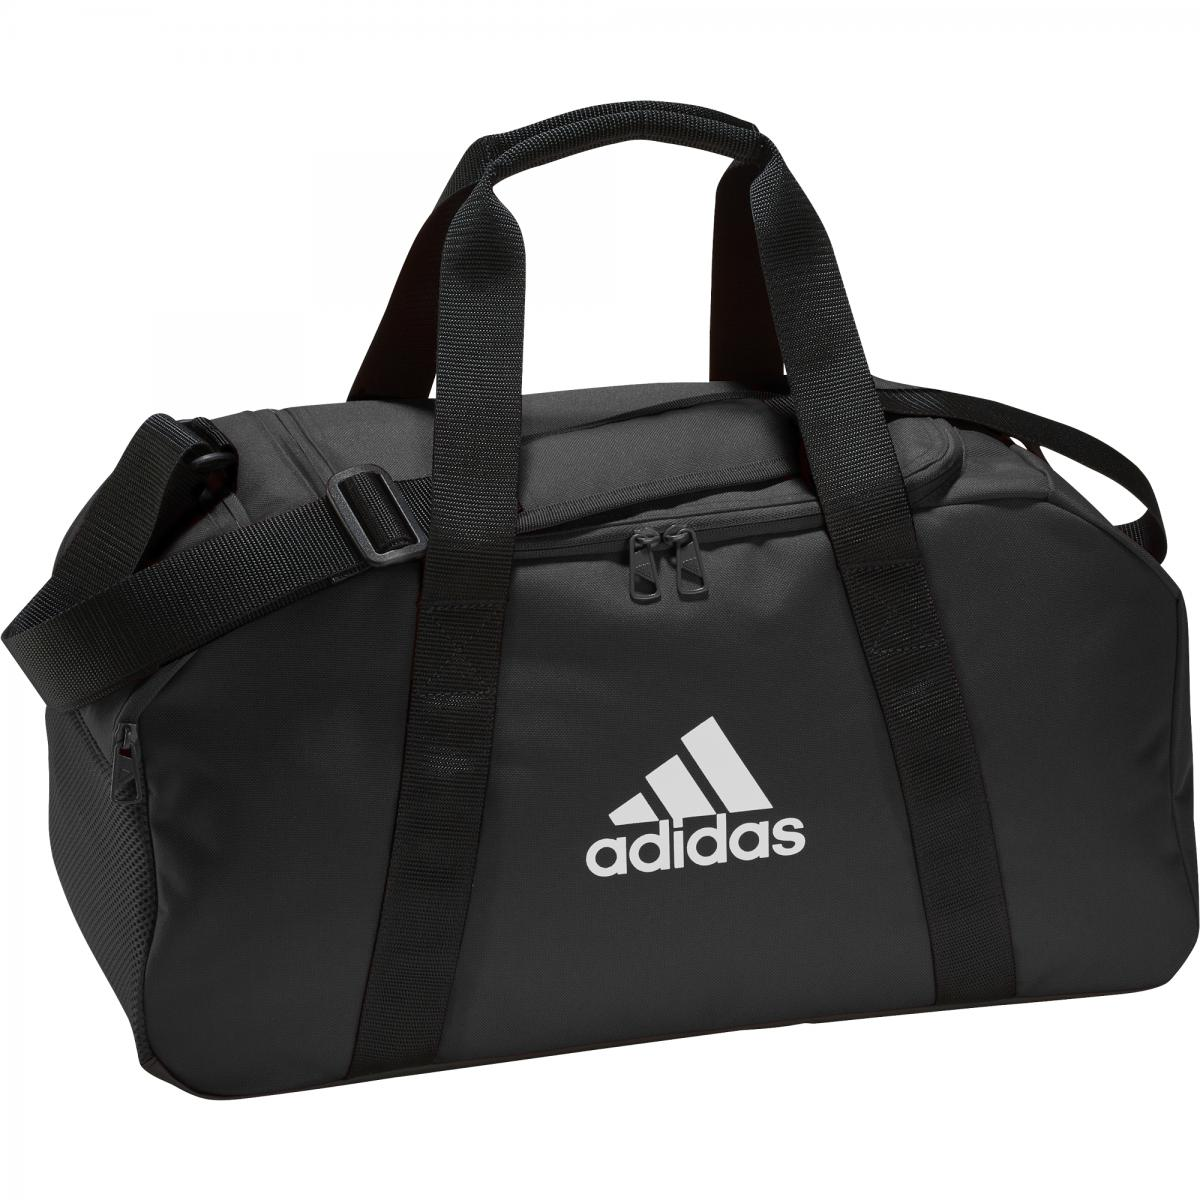 Adidas  Tiro Du S, bagger